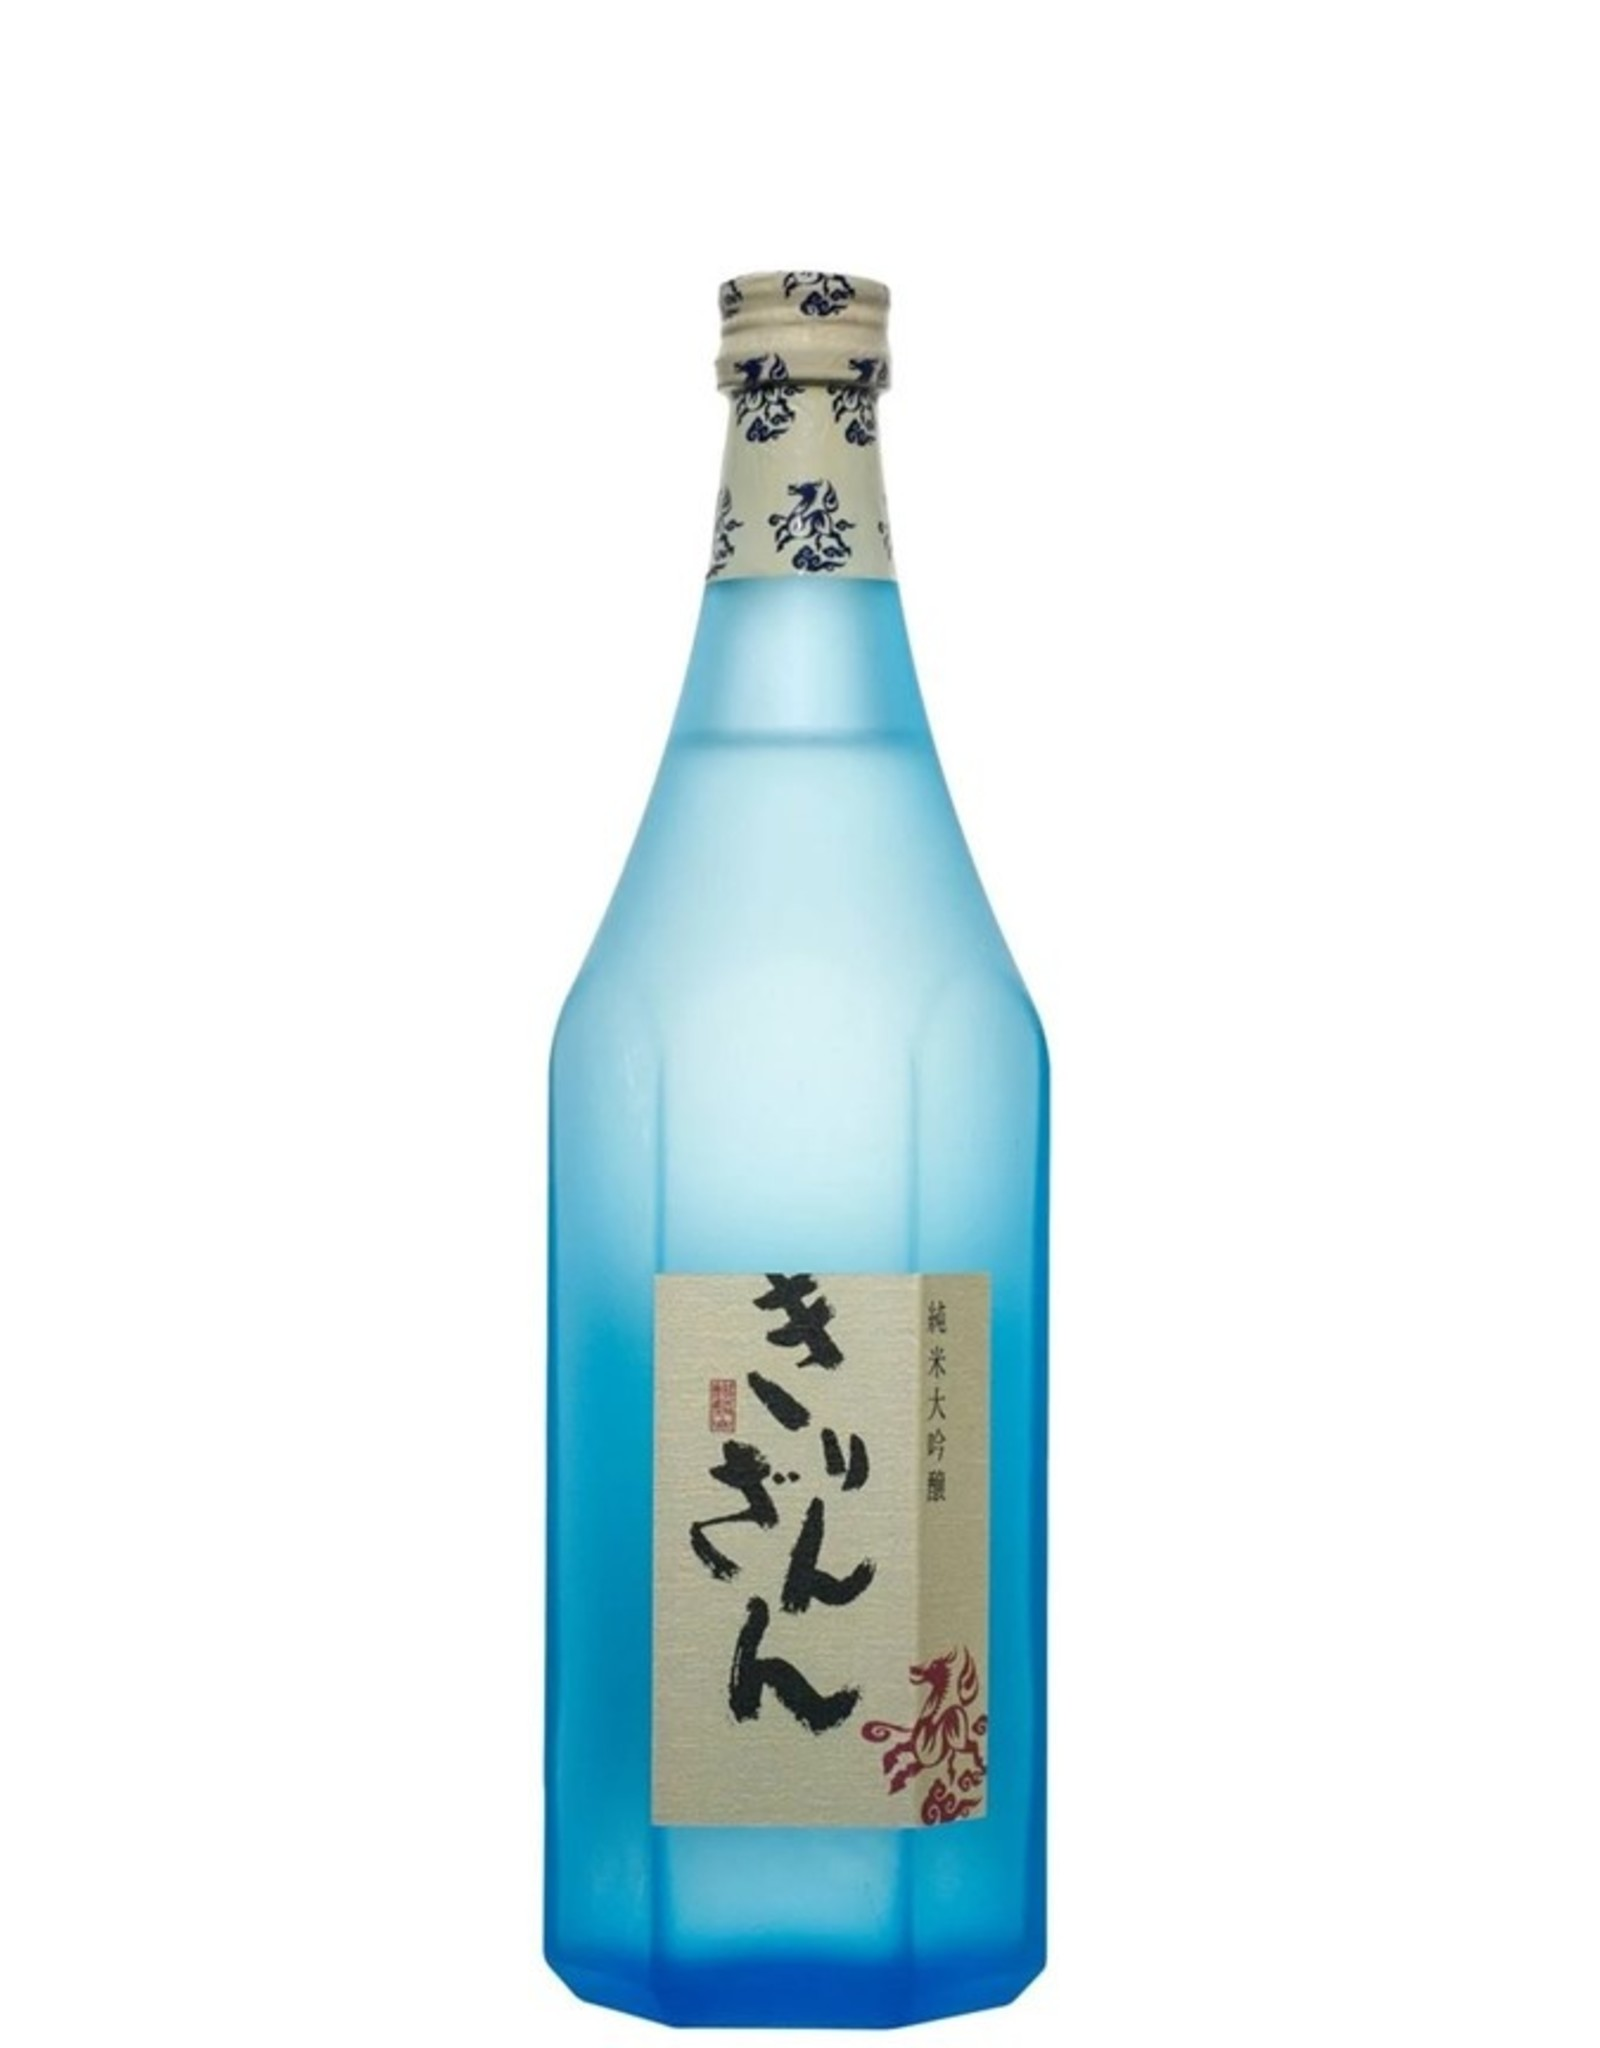 "Kirinzan ""Flying Dragon"" Junmai Daiginjo Sake 720ml"